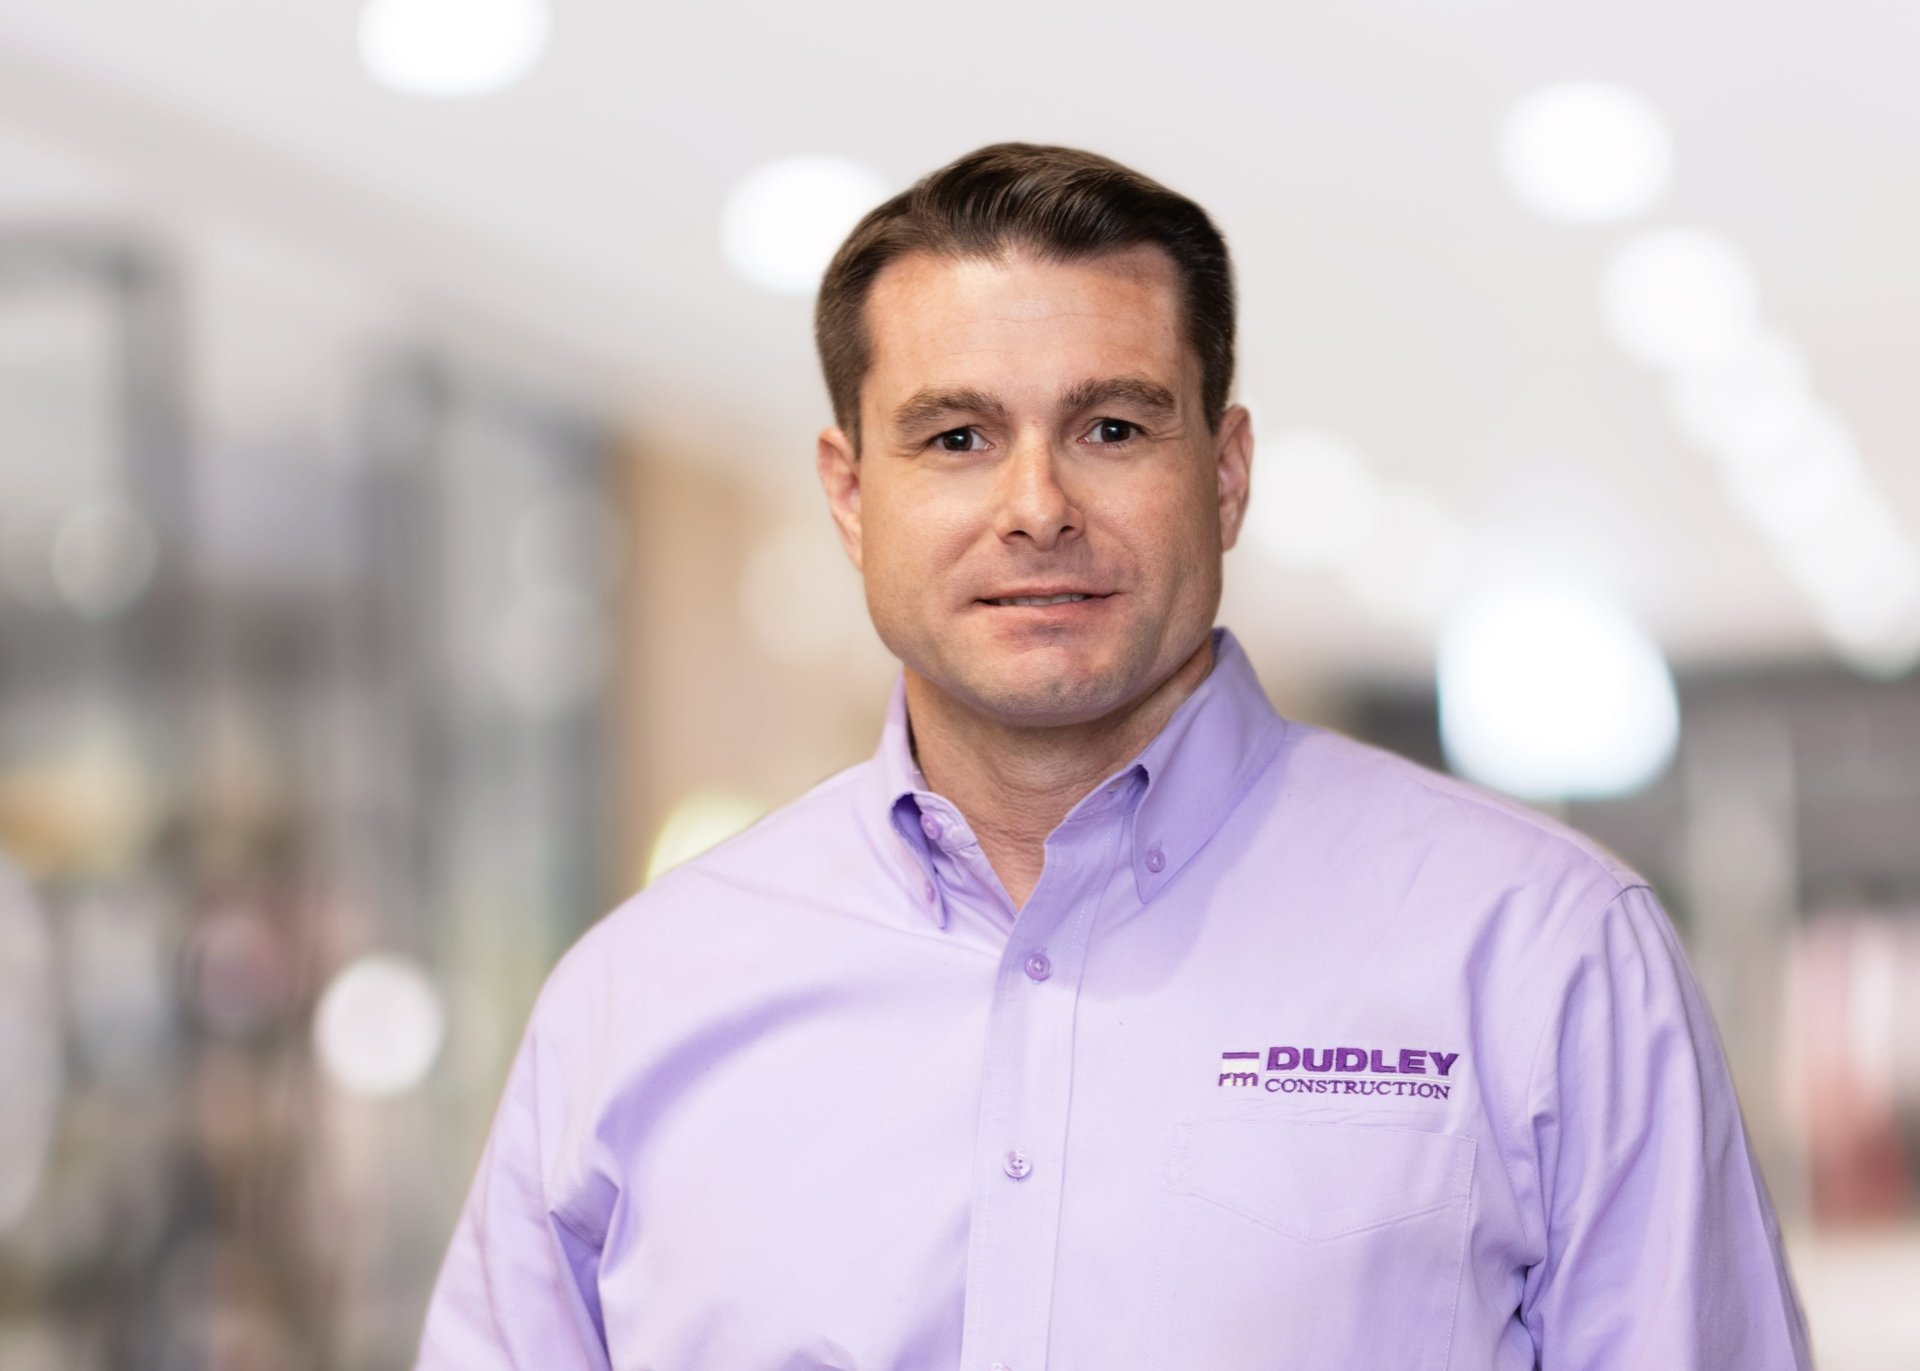 RM Dudley Construction – Meet Our Team